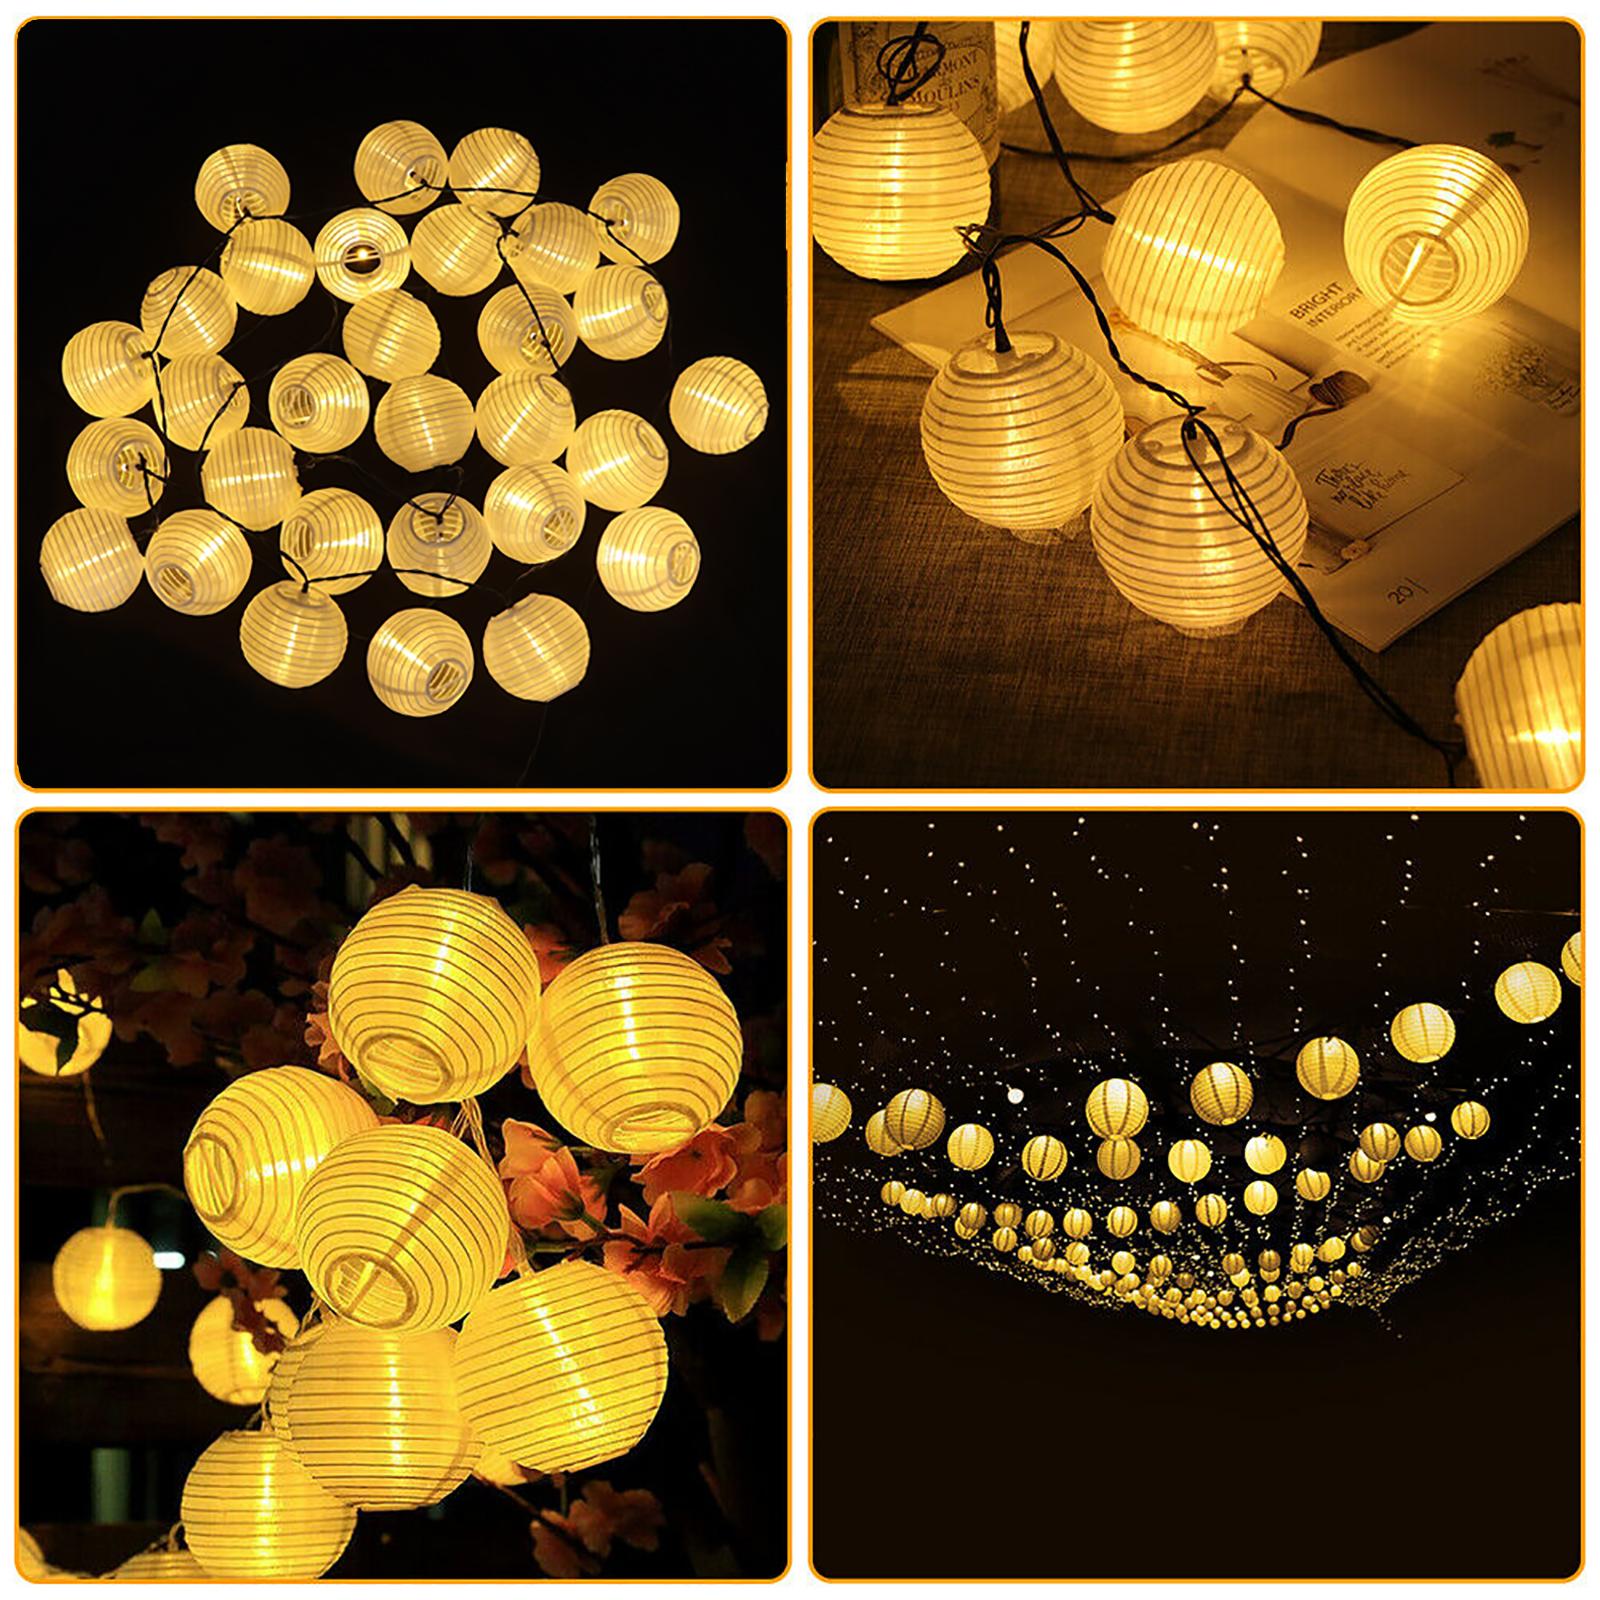 30 Led Warm White Fairy String Lights Solar Power Chinese Lantern Outdoor Decor Ebay